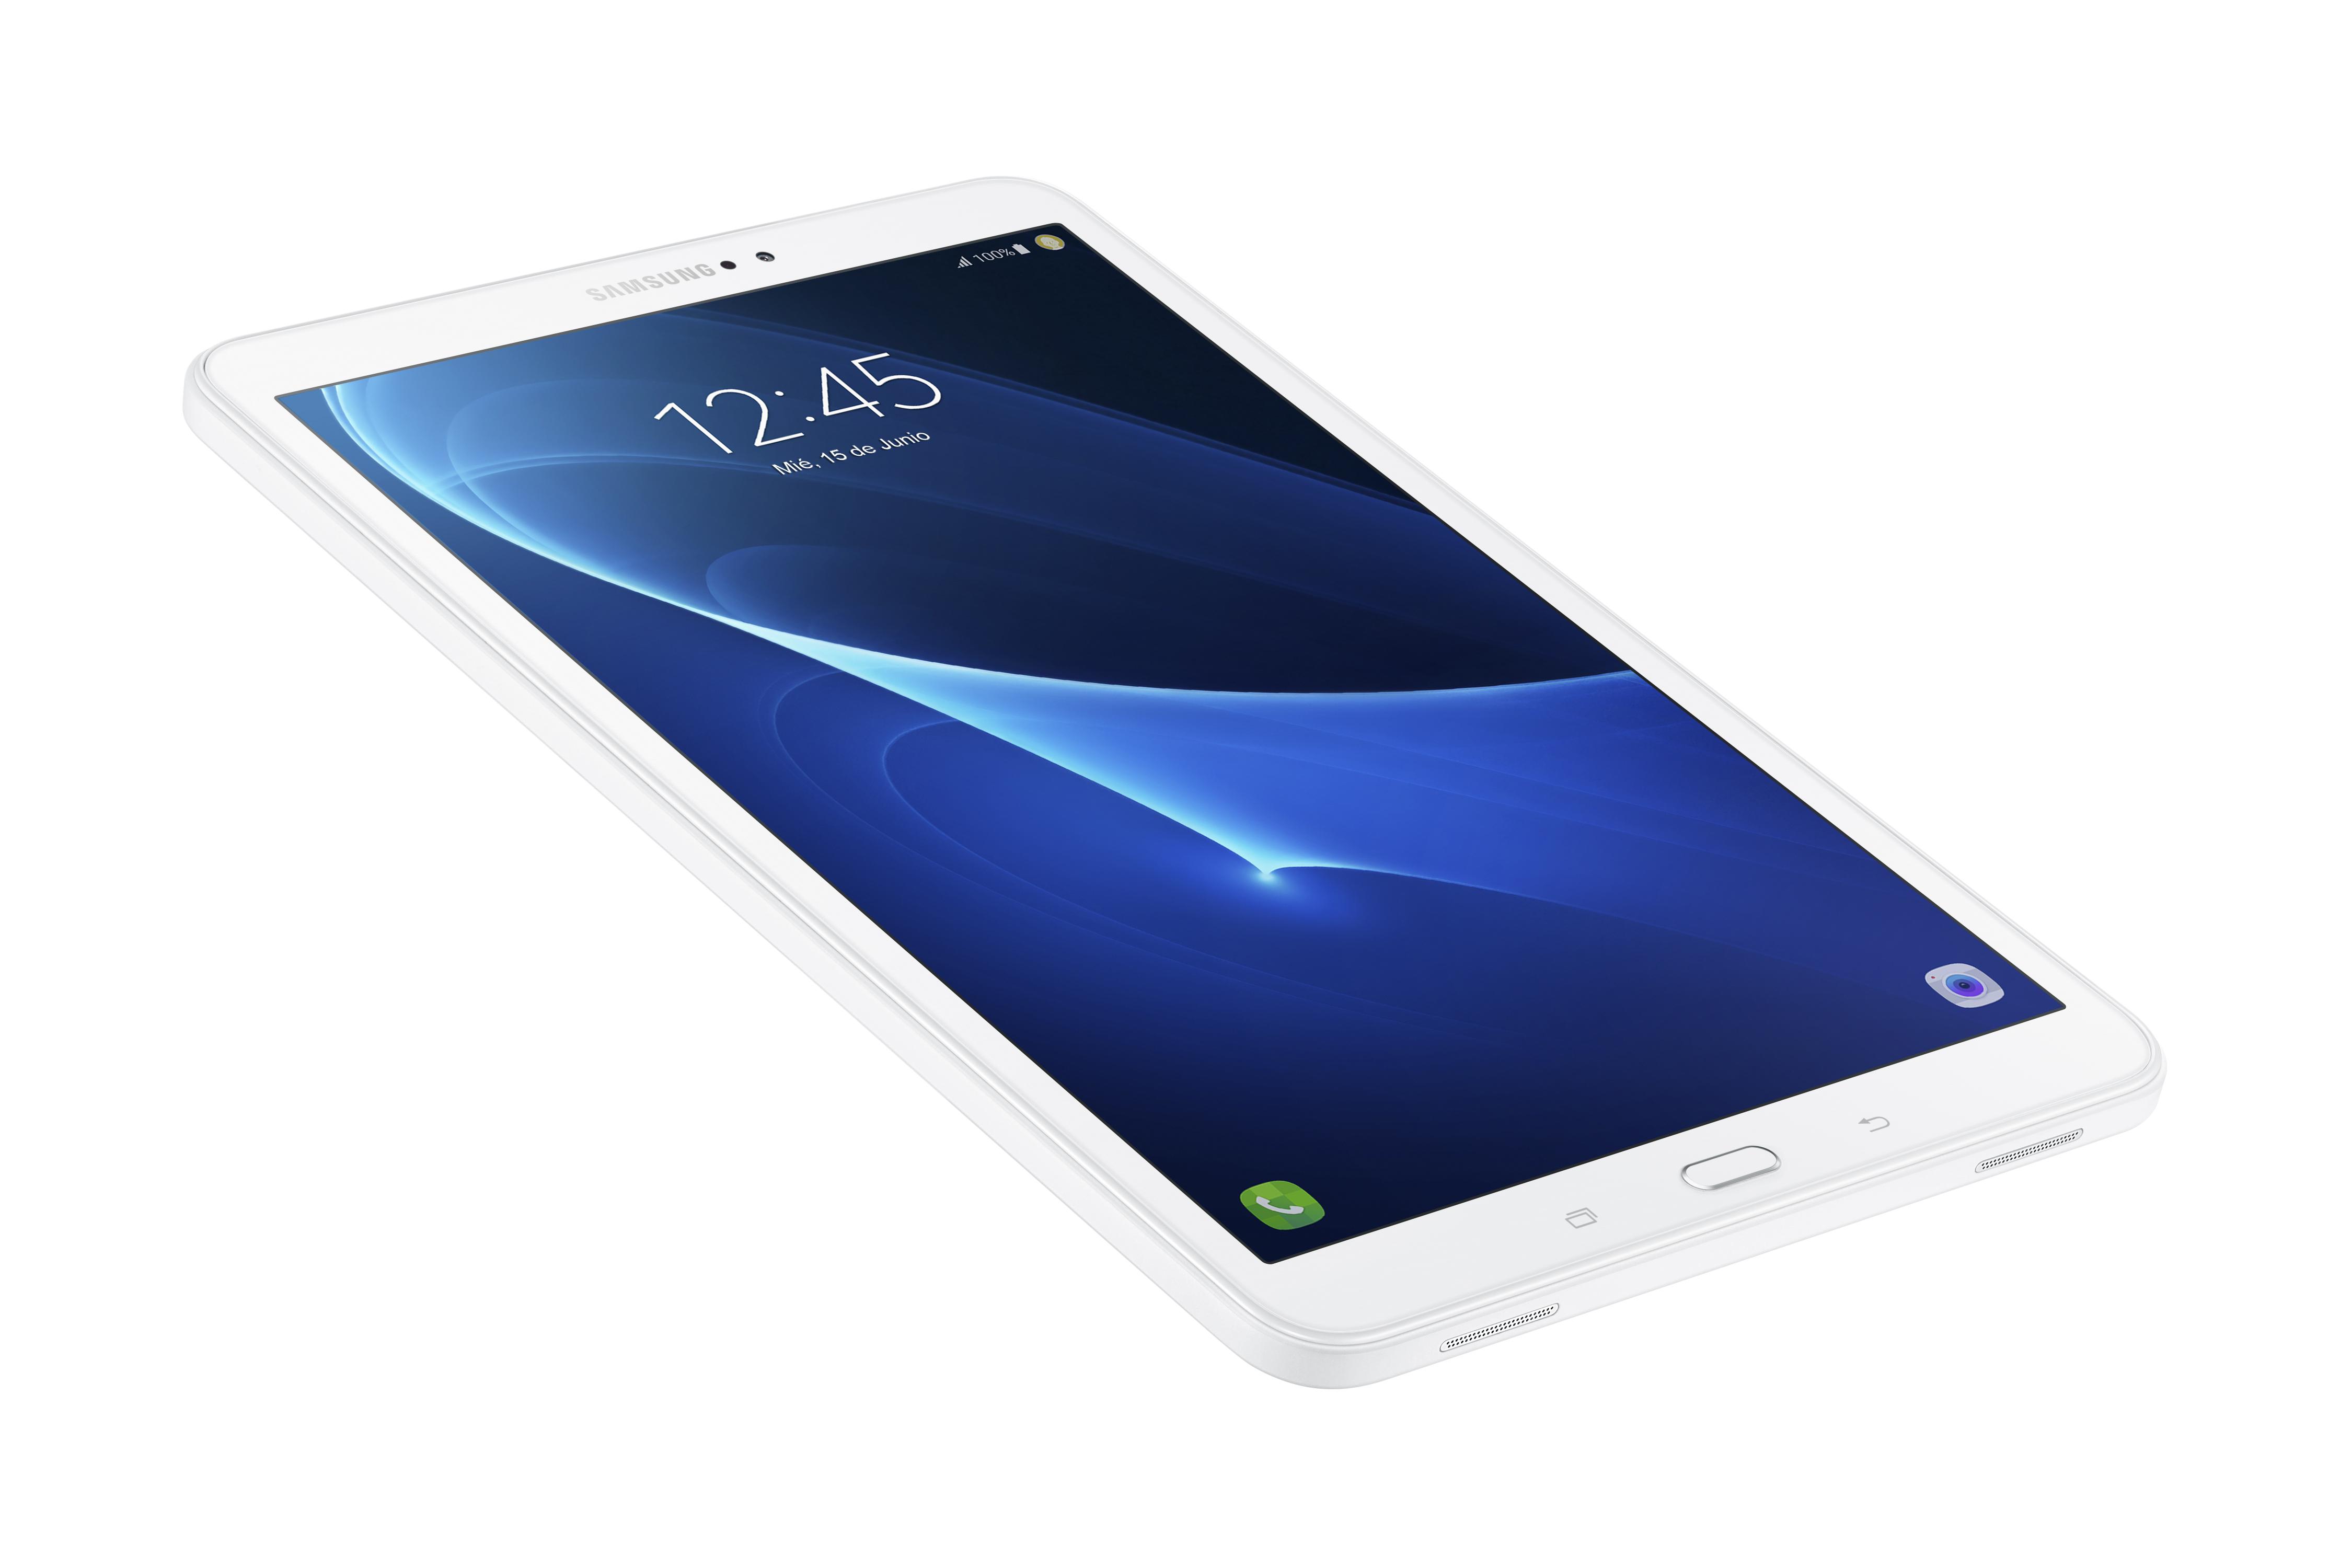 Tablet-SAMSUNG-TAB-A-10-1-039-039-Blanca-RAM-2-GB-Almacenamiento-32-GB